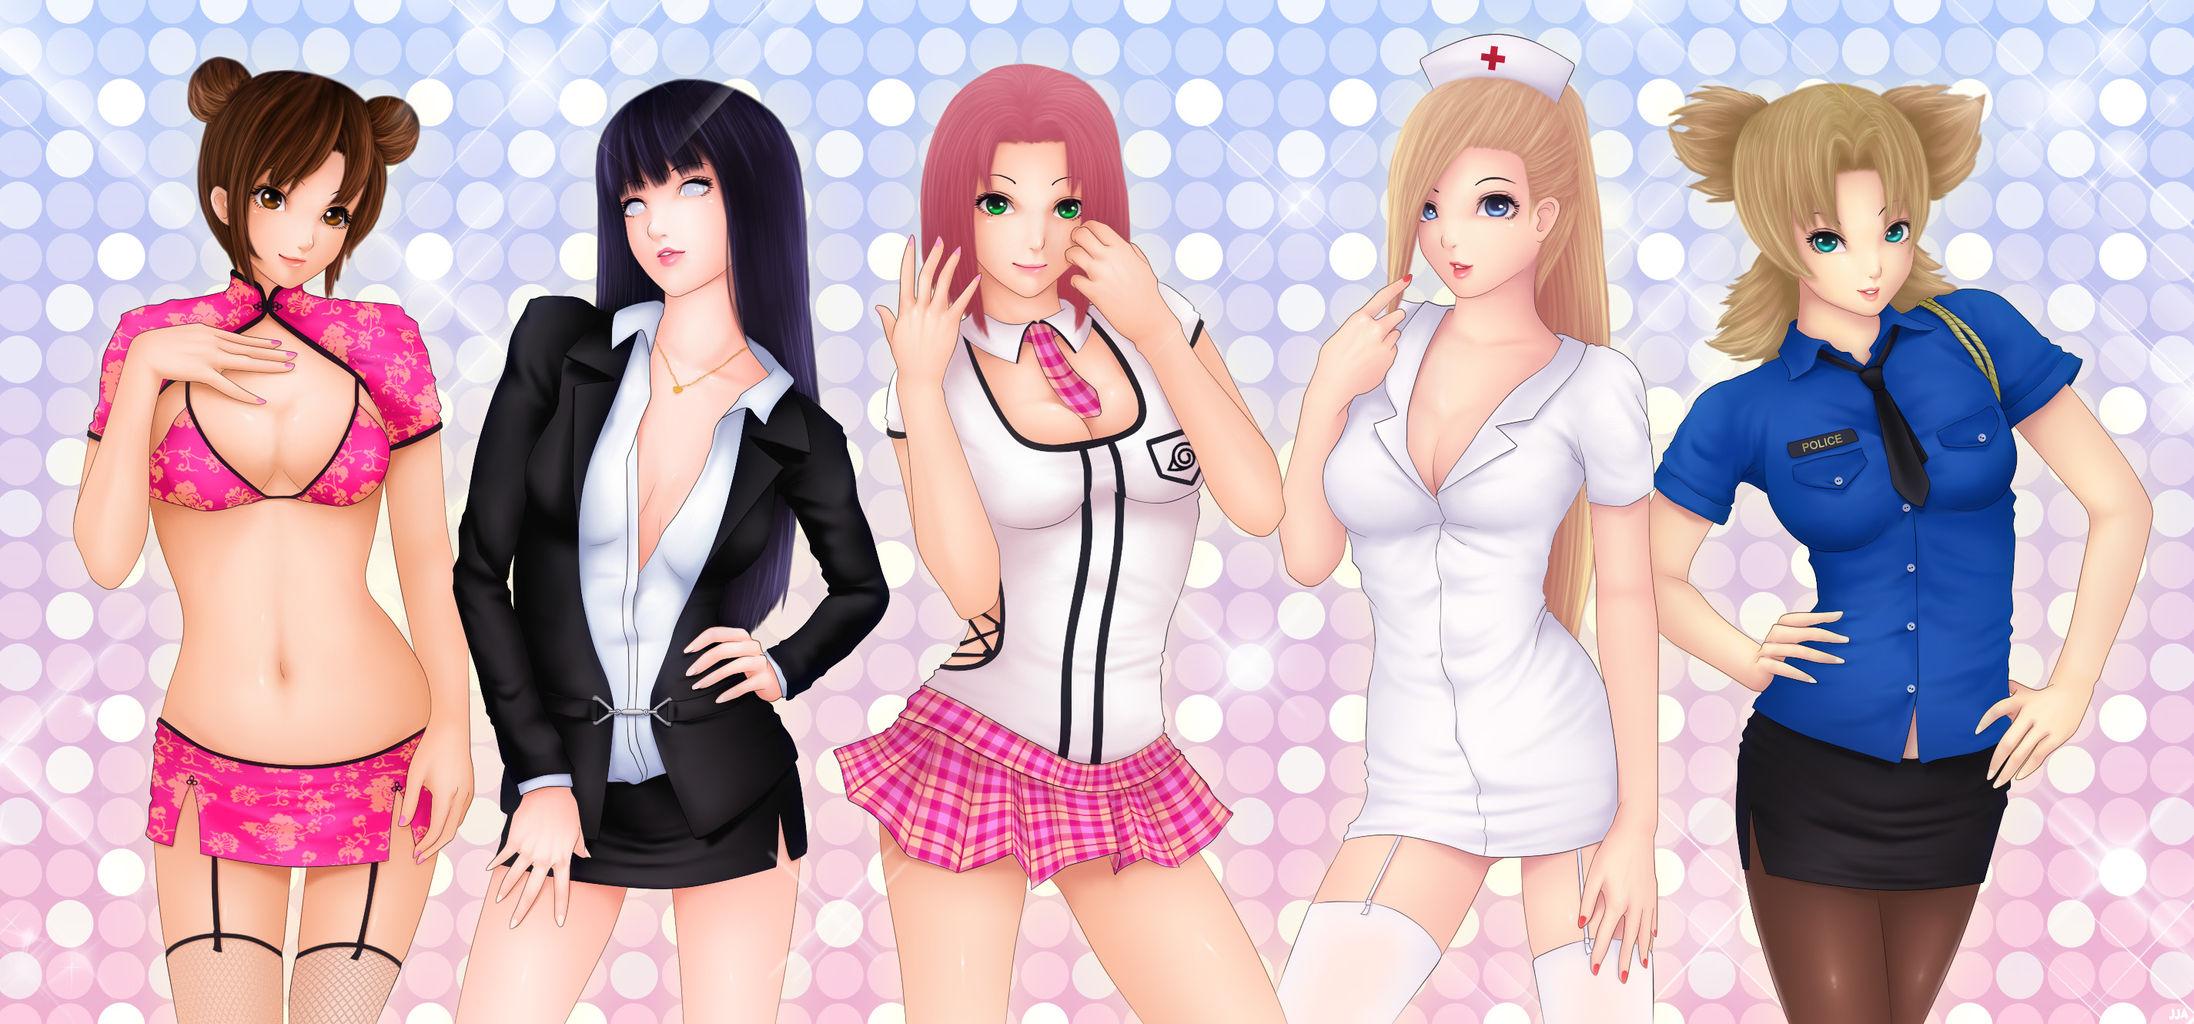 Image Result For Anime Wallpaper Rssa